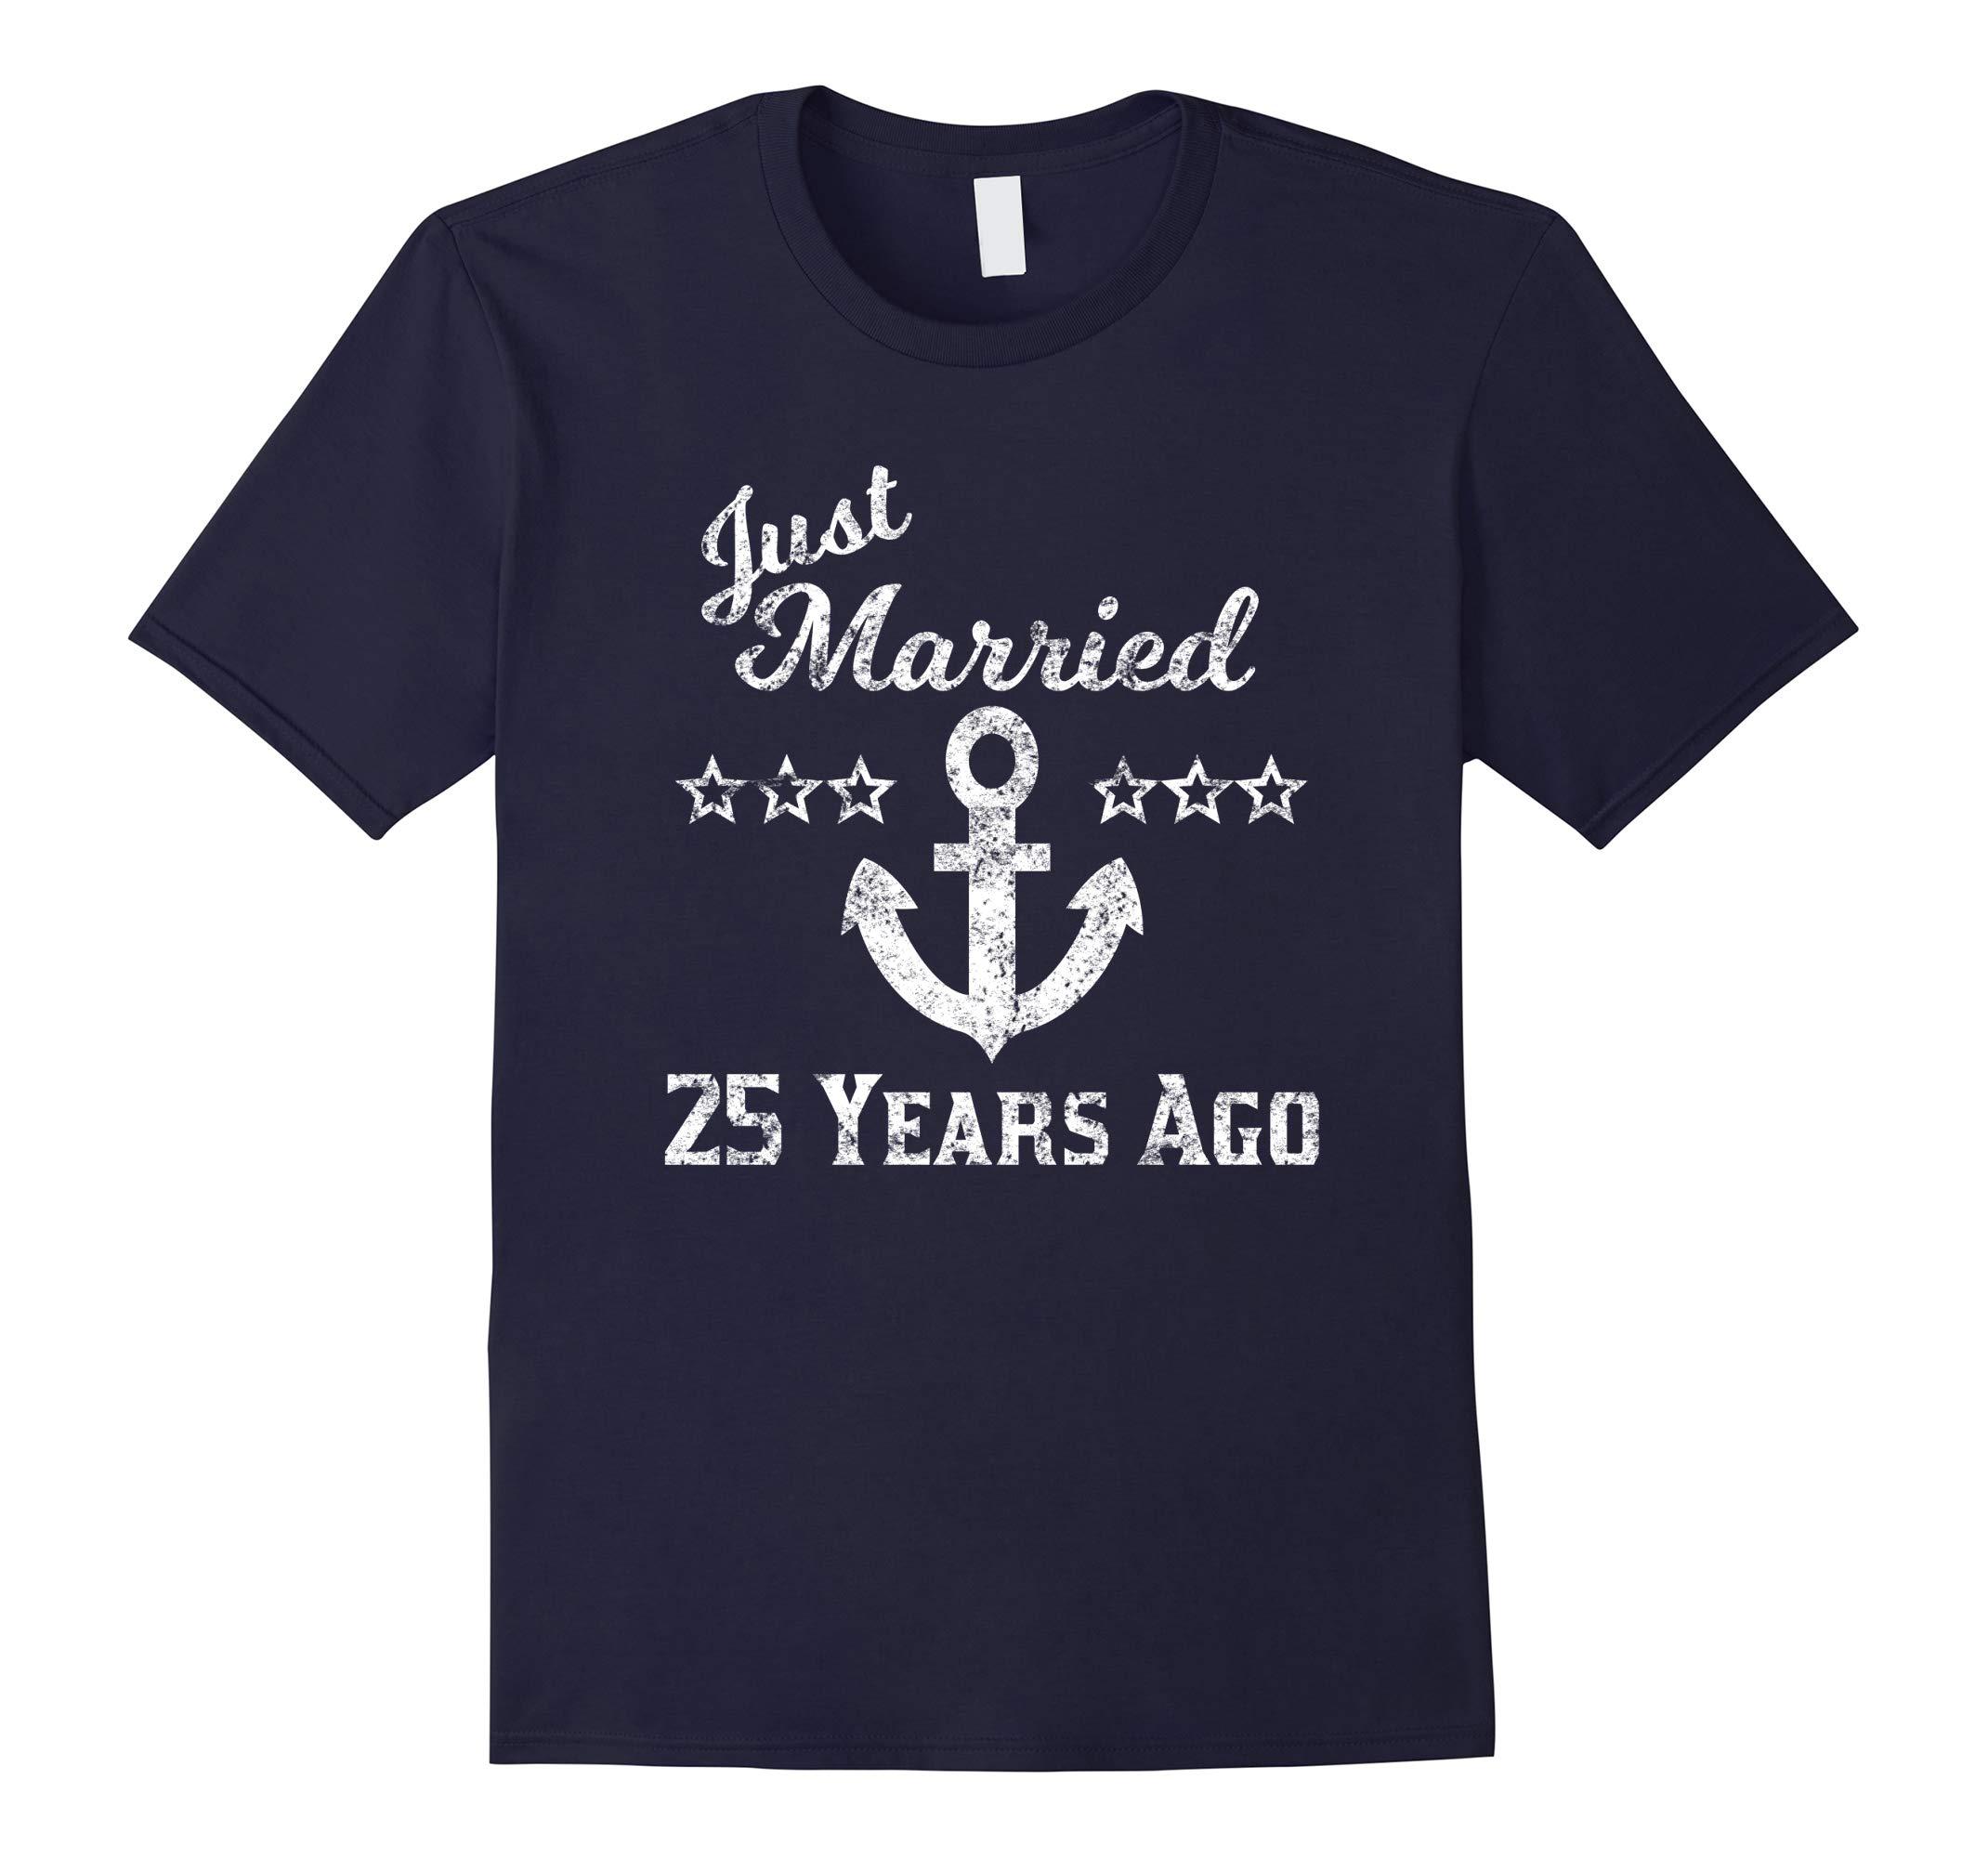 25th Anniversary Cruise Shirt Just Married 25 Years Ago-RT